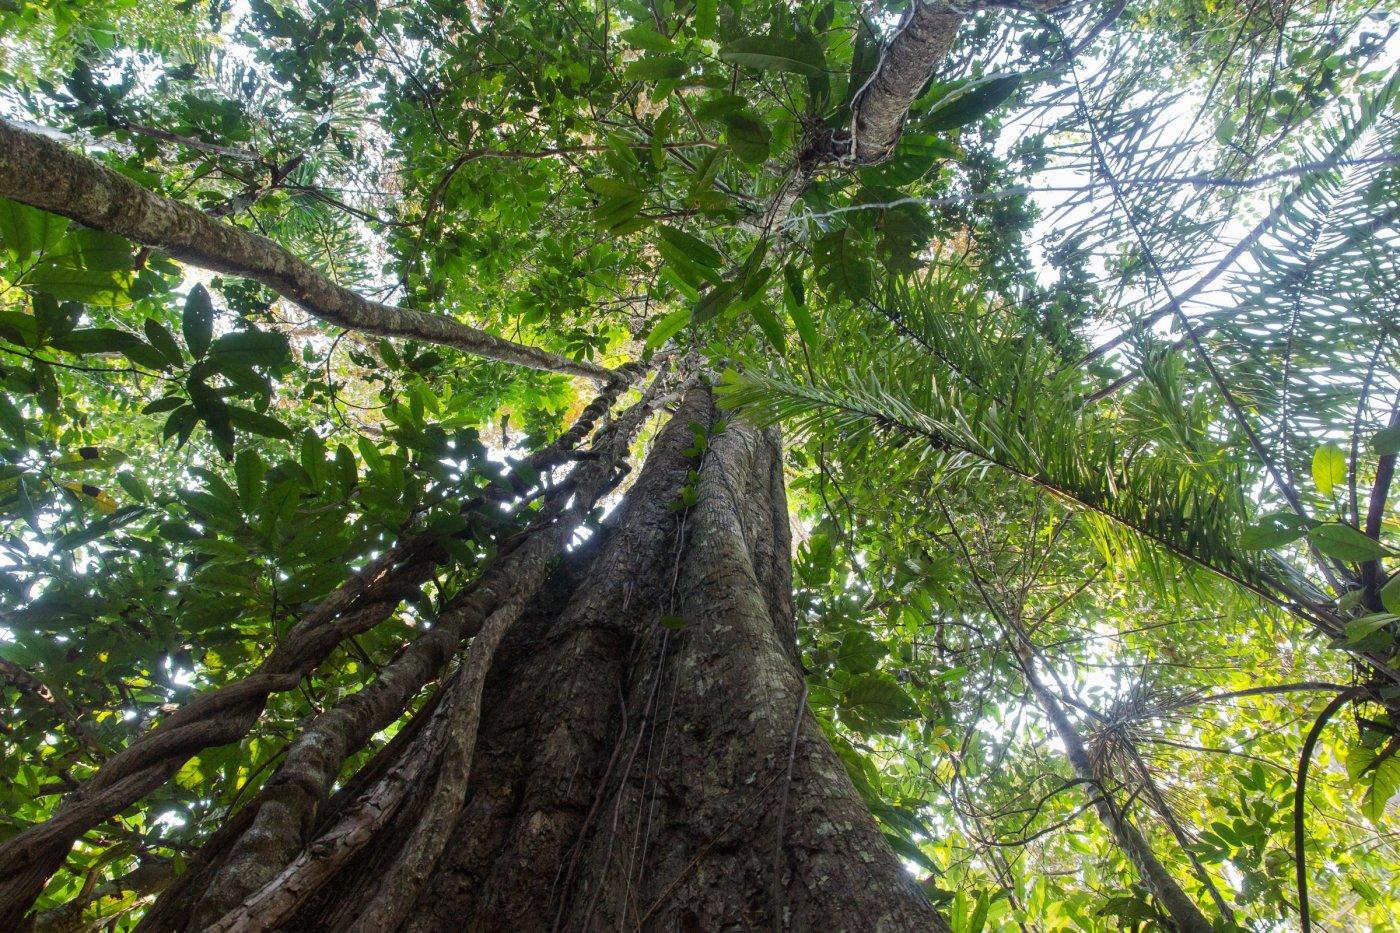 thaki-voyage-partir-aventure-dans-une-foret-amazonienne